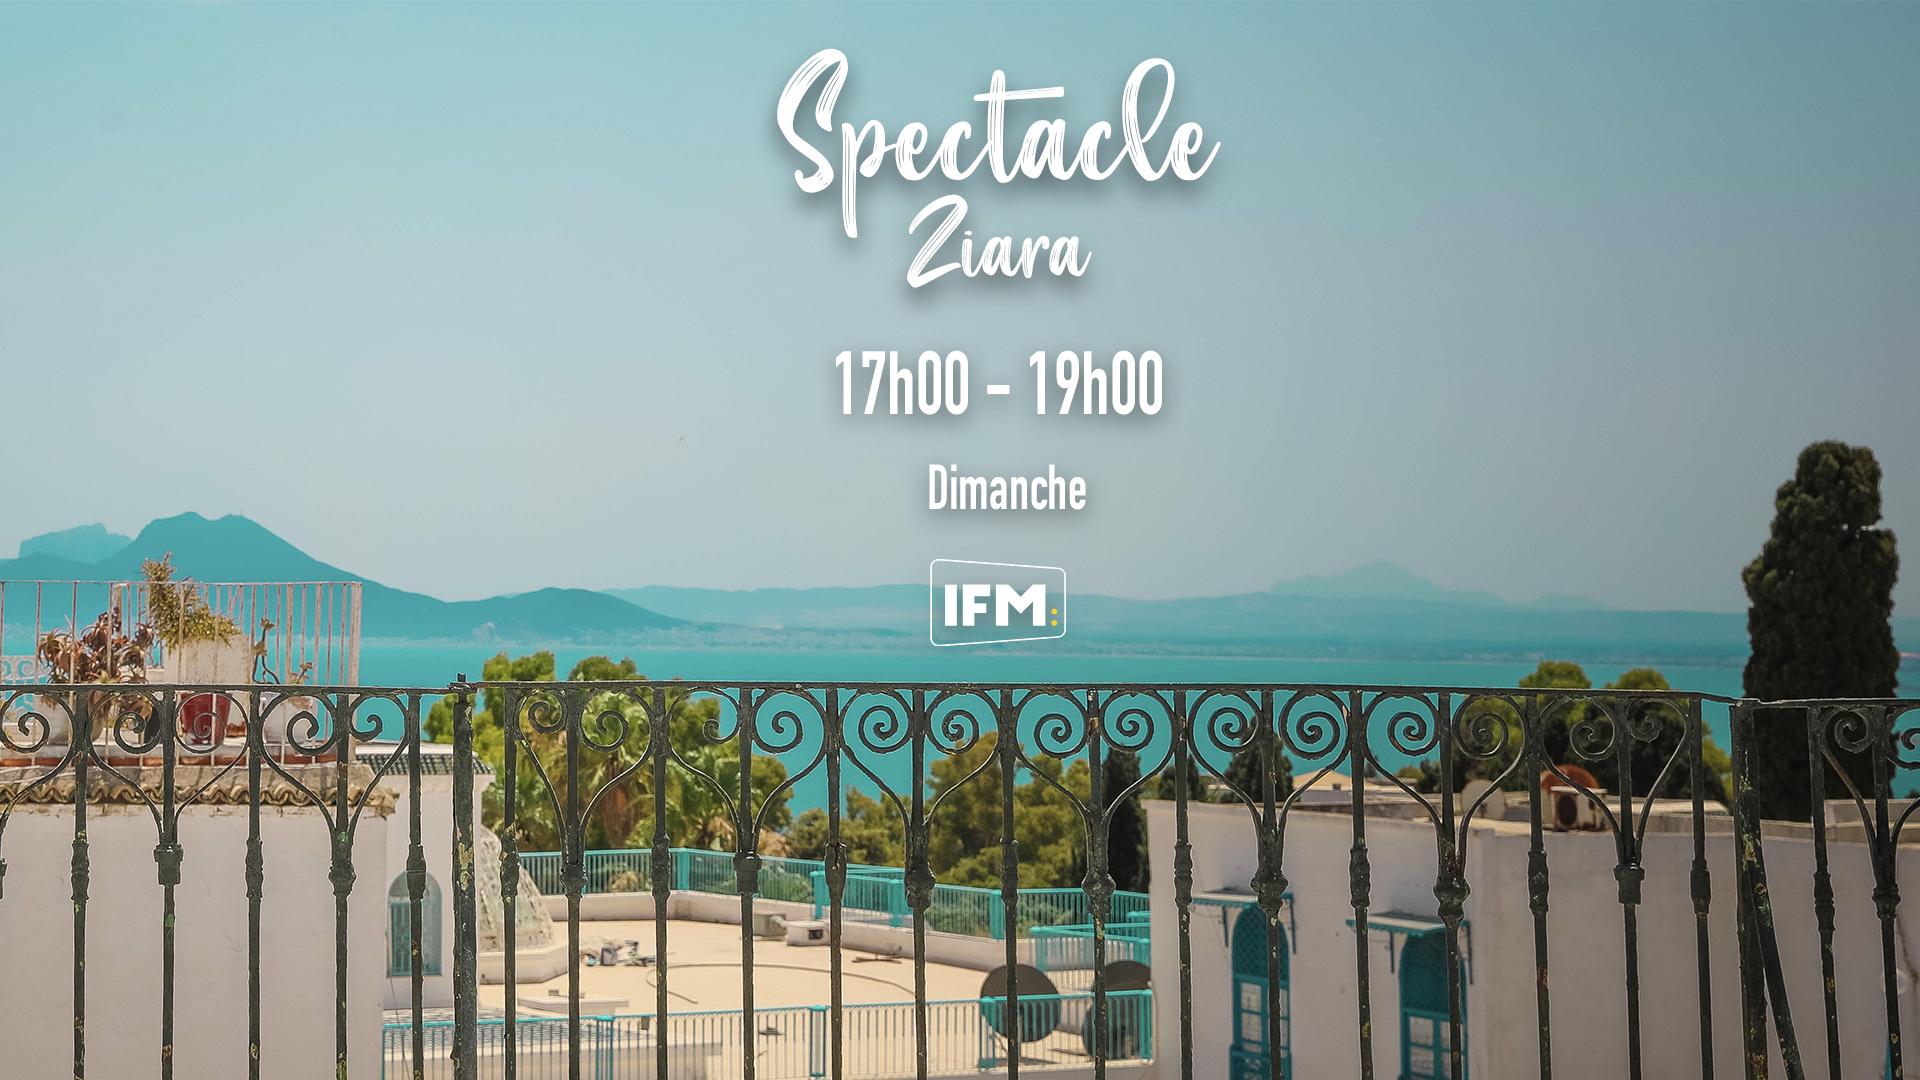 Spectacle Ziara